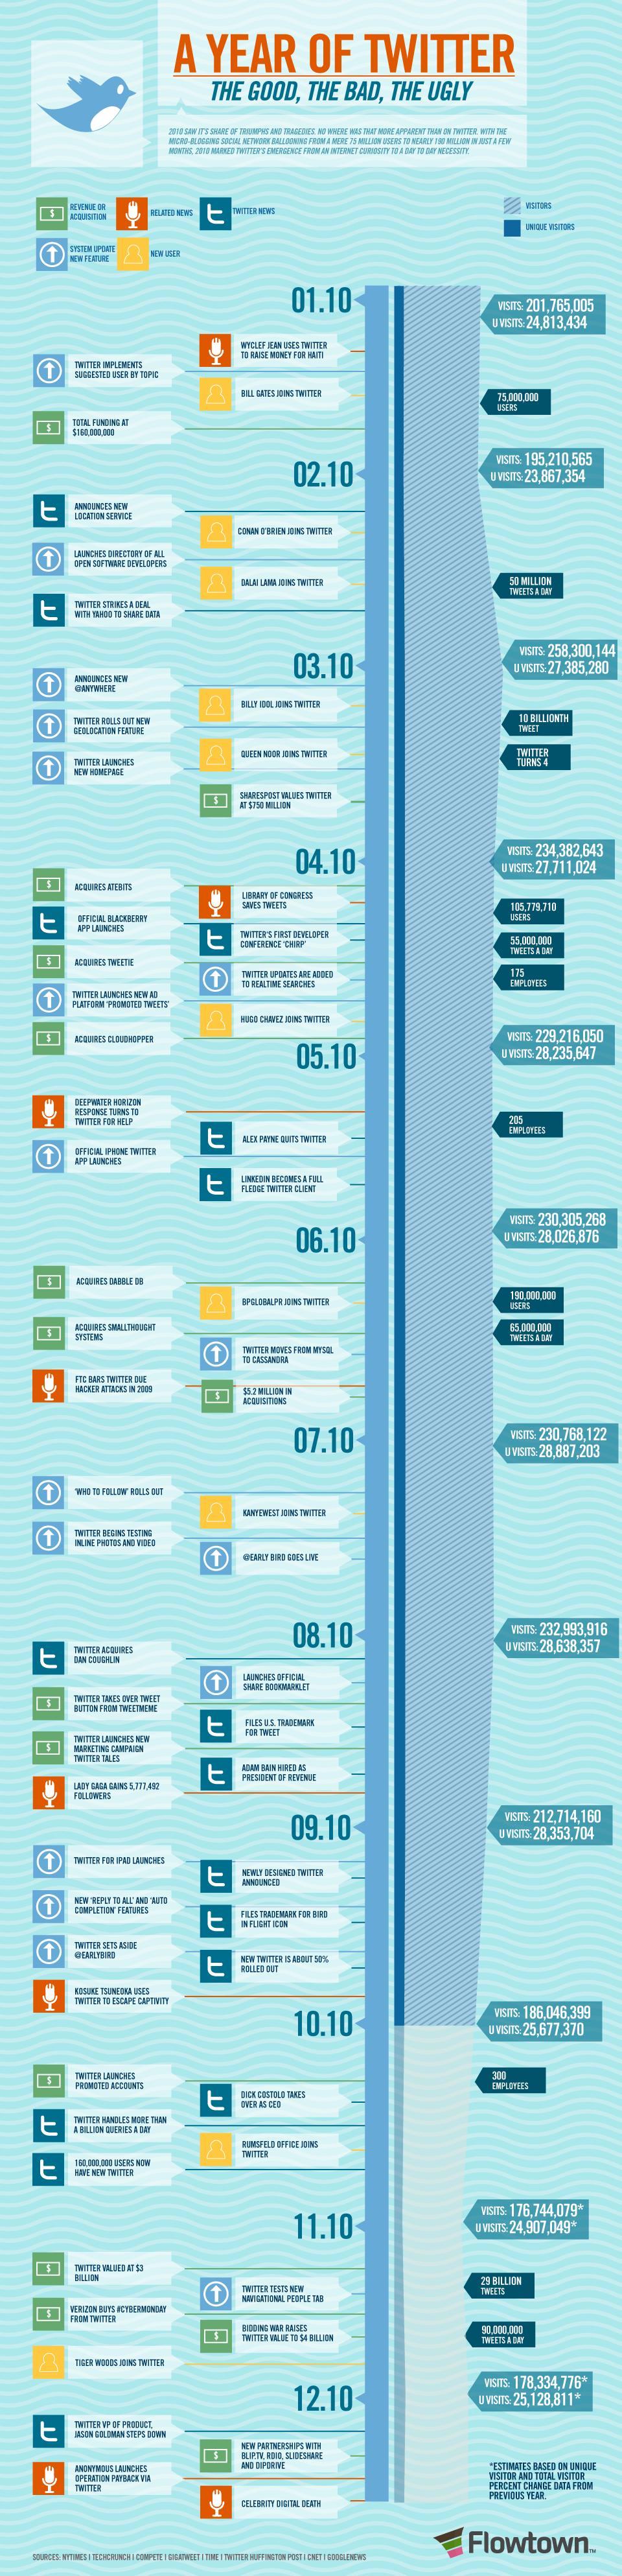 Twitter en 2010 en image et en chiffres